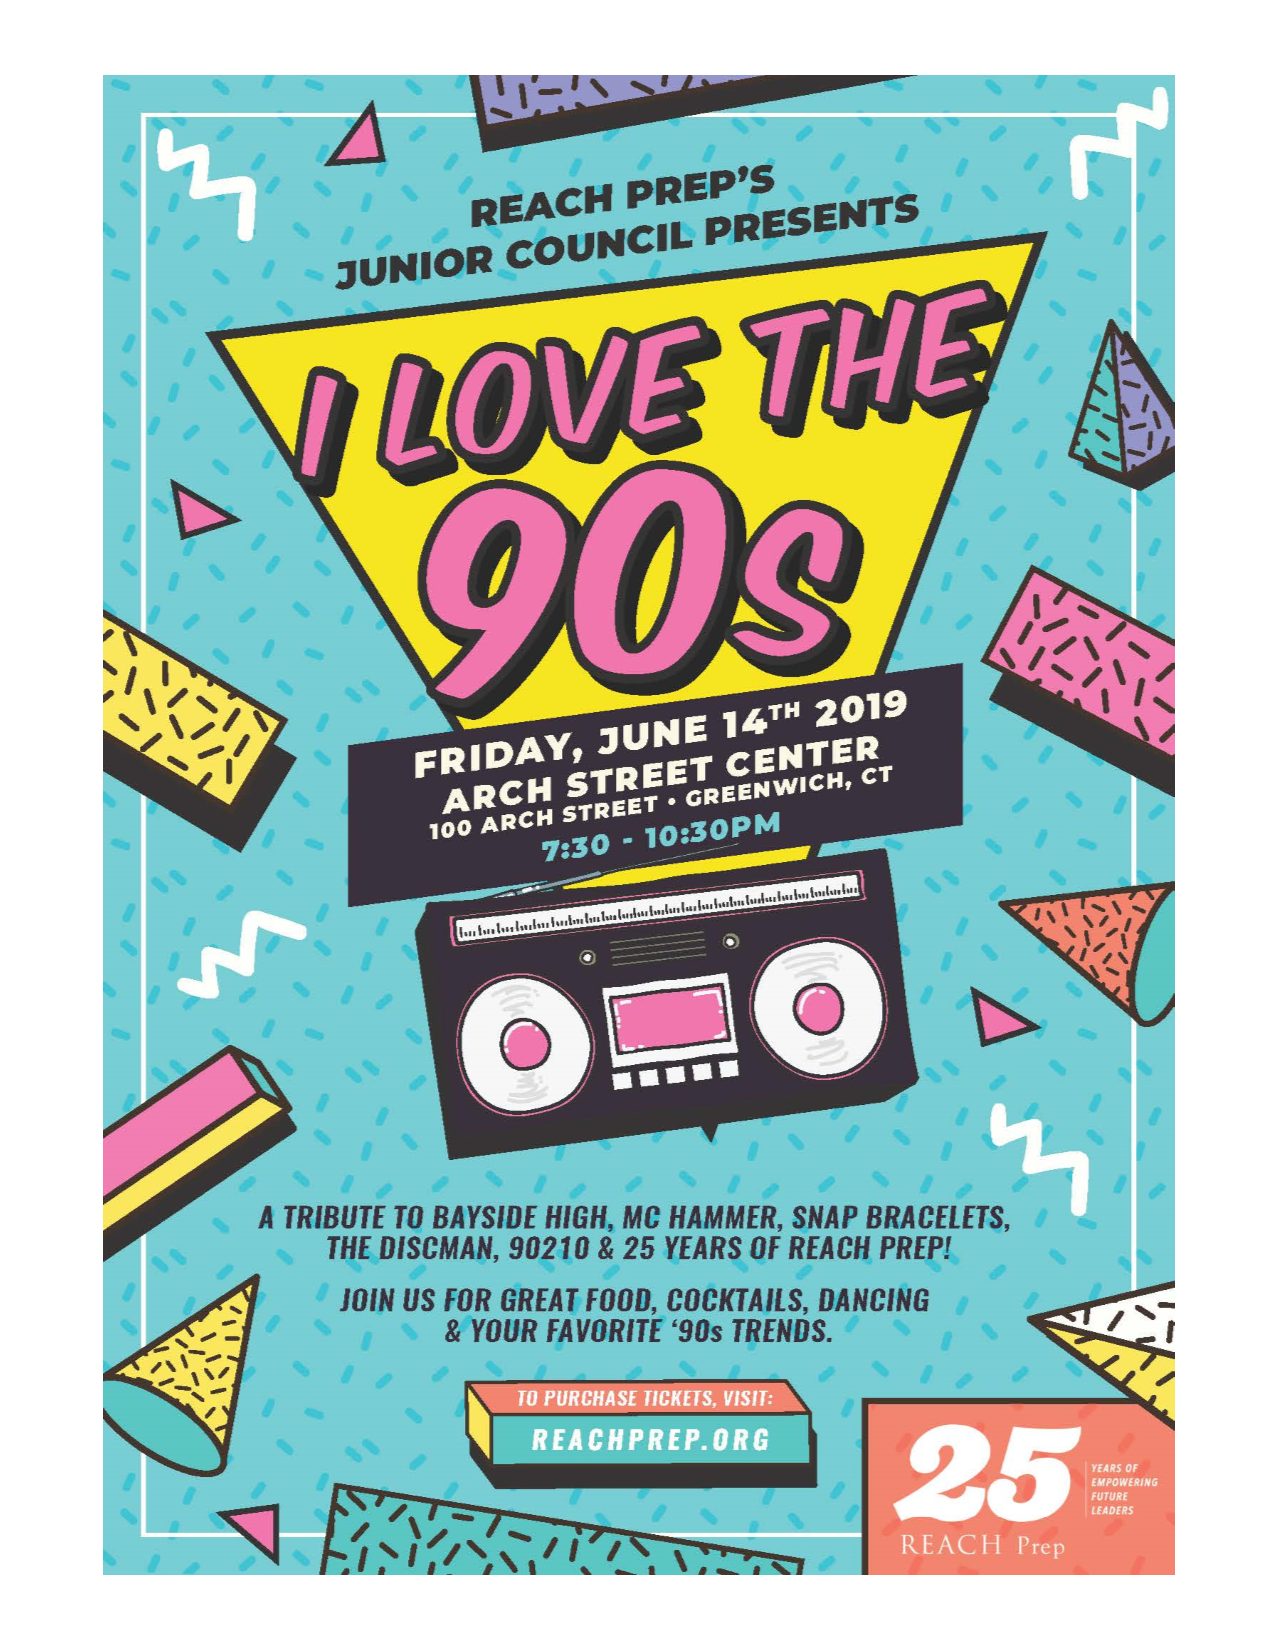 REACH Prep's Junior Council Presents - I Love the '90s!